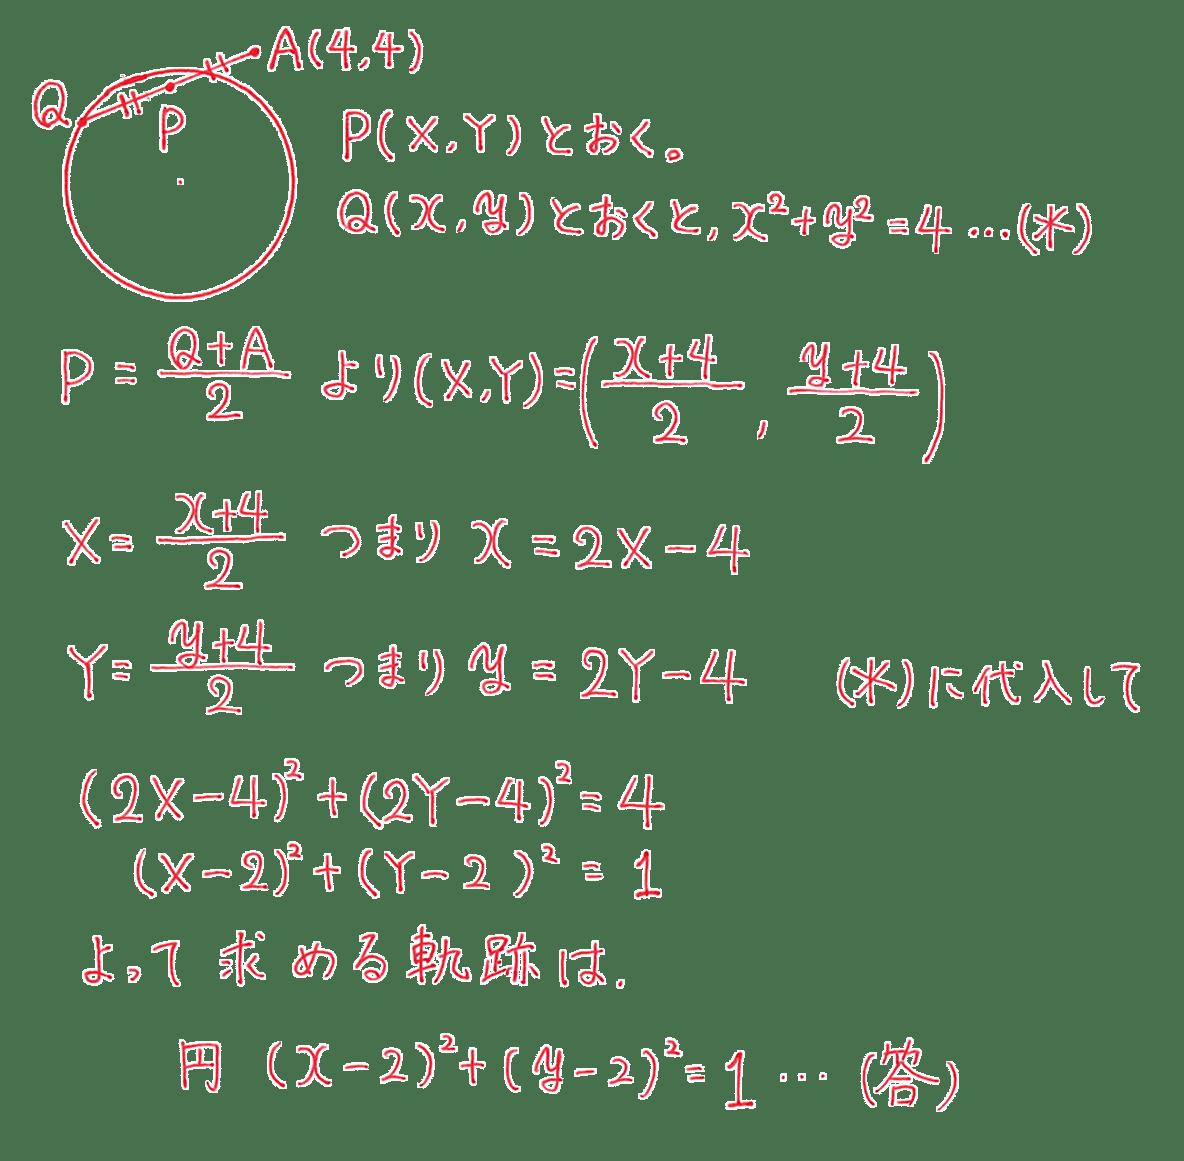 高校数学Ⅱ 図形と方程式30 練習 答え